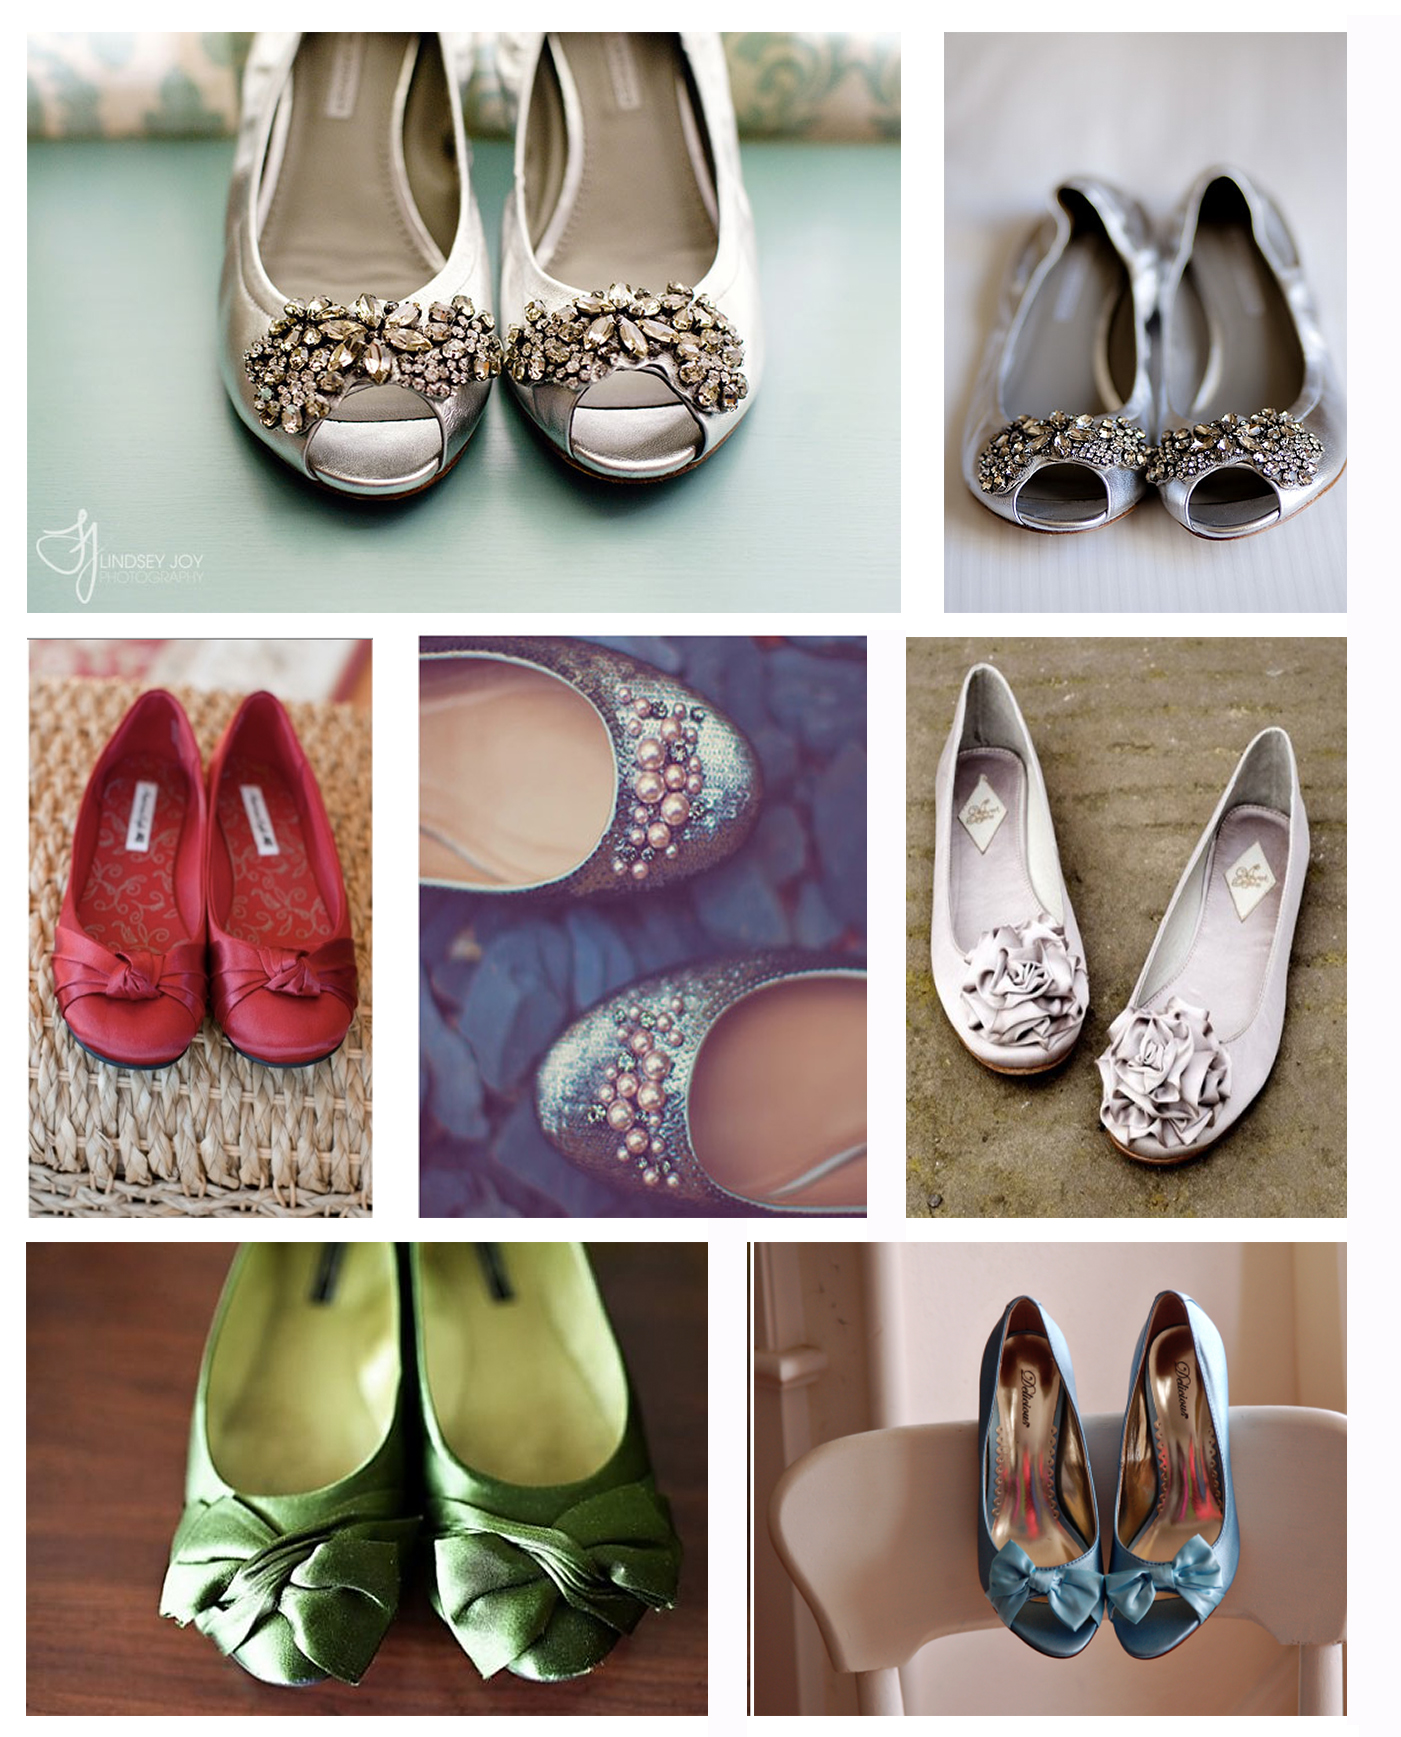 wedding shoes wedding flats wedding flats Wd wedding flats shoes